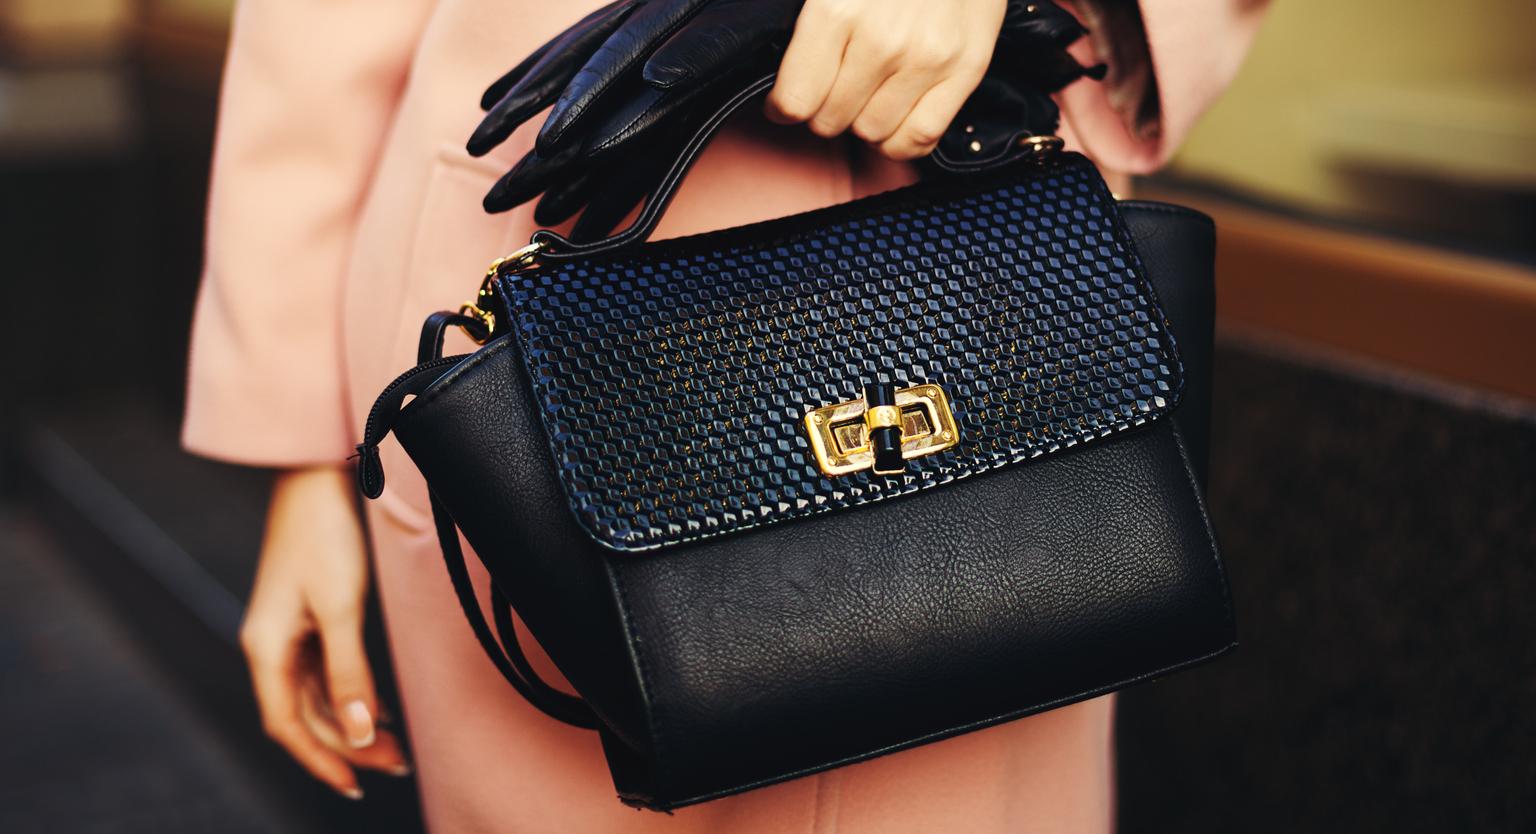 Top 6 Tips for Choosing the Perfect Handbag